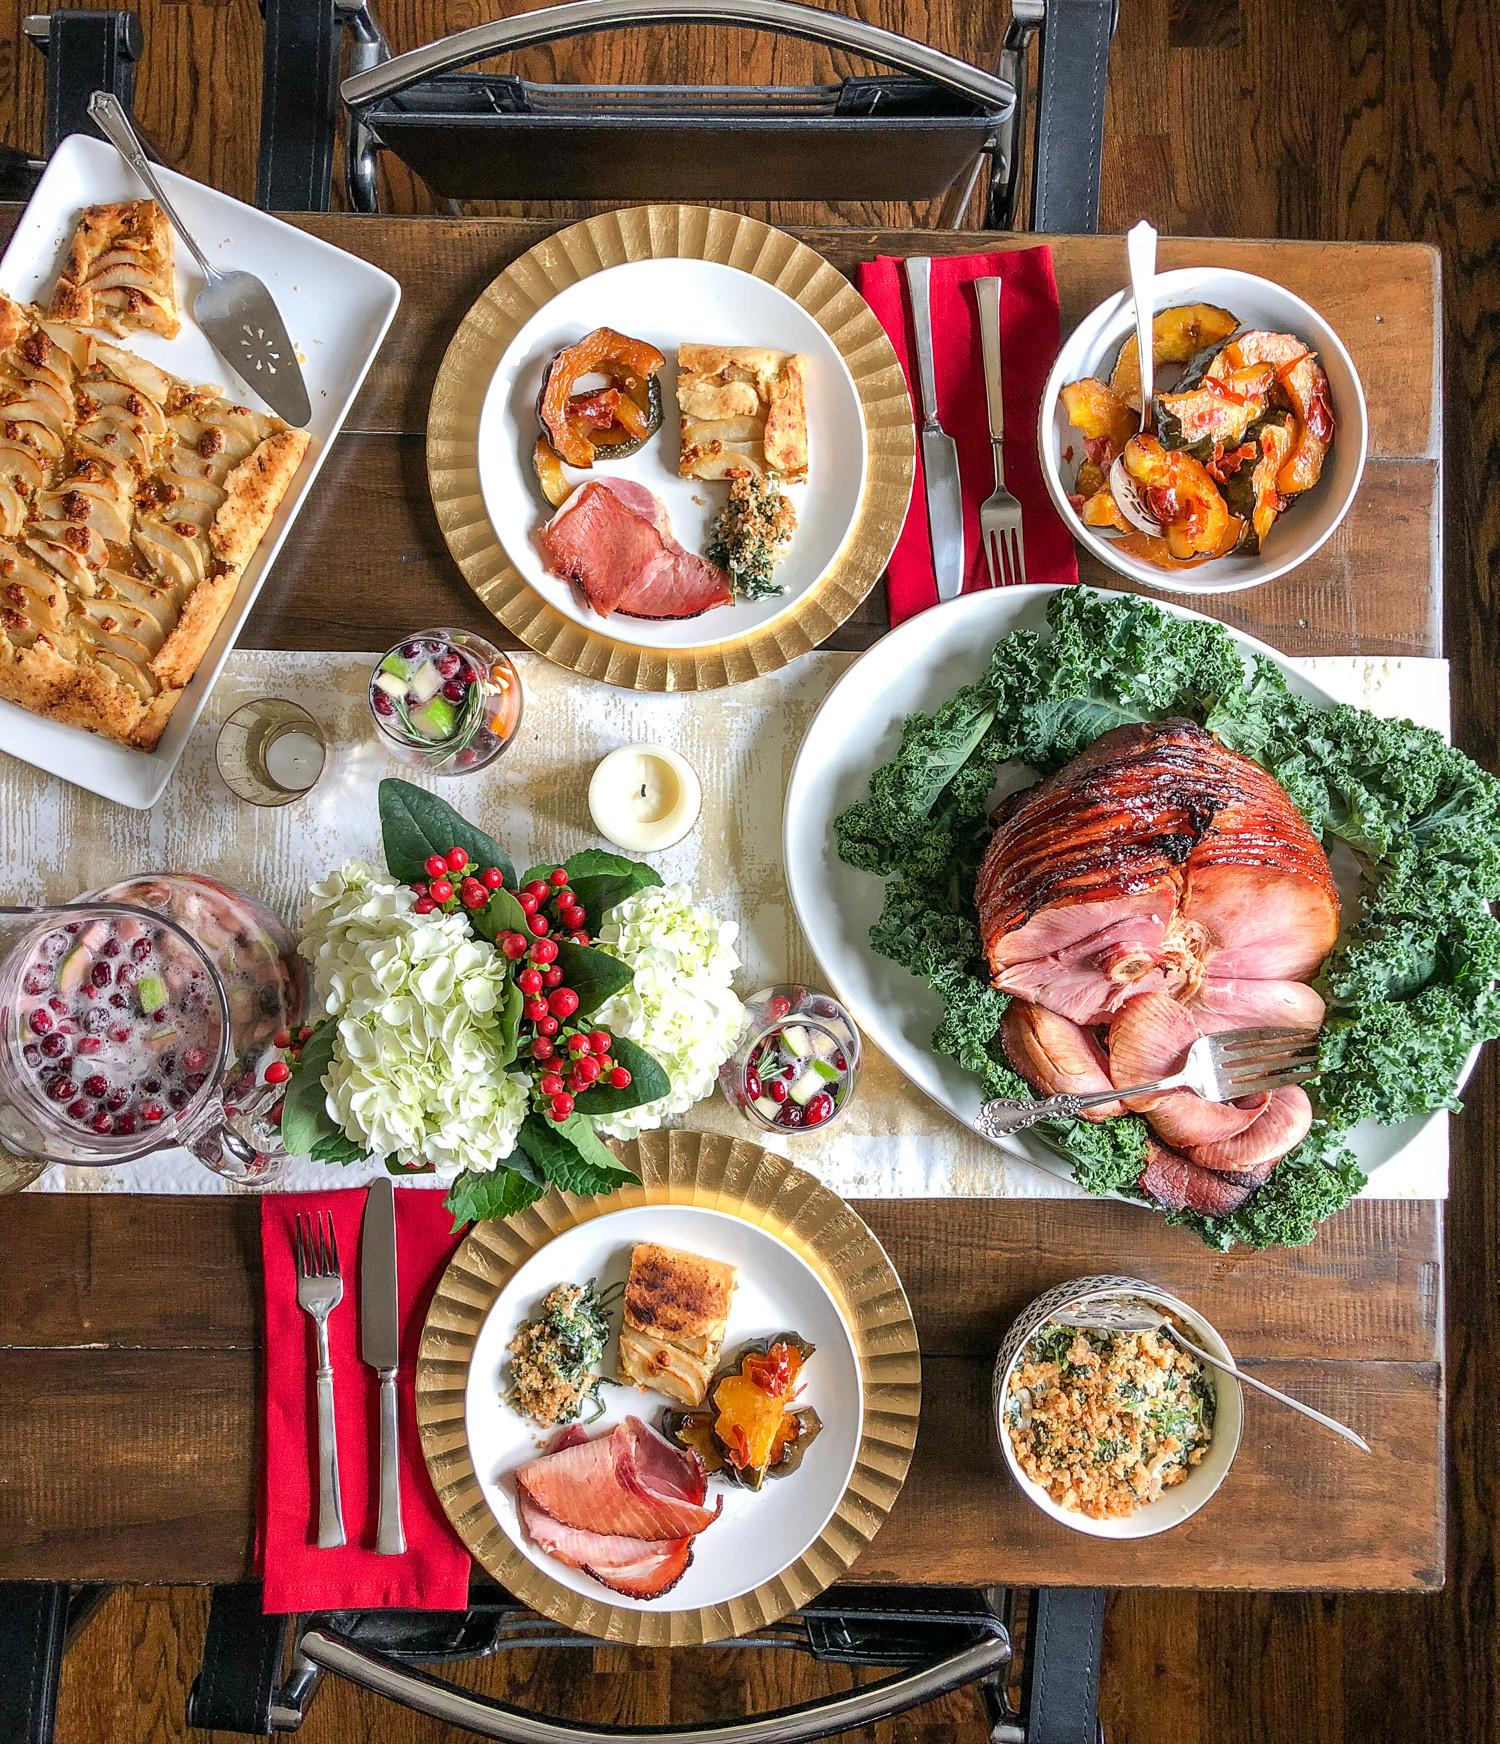 Ham Christmas Dinner  Christmas Dinner Menu Ideas Plan a Memorable Meal for